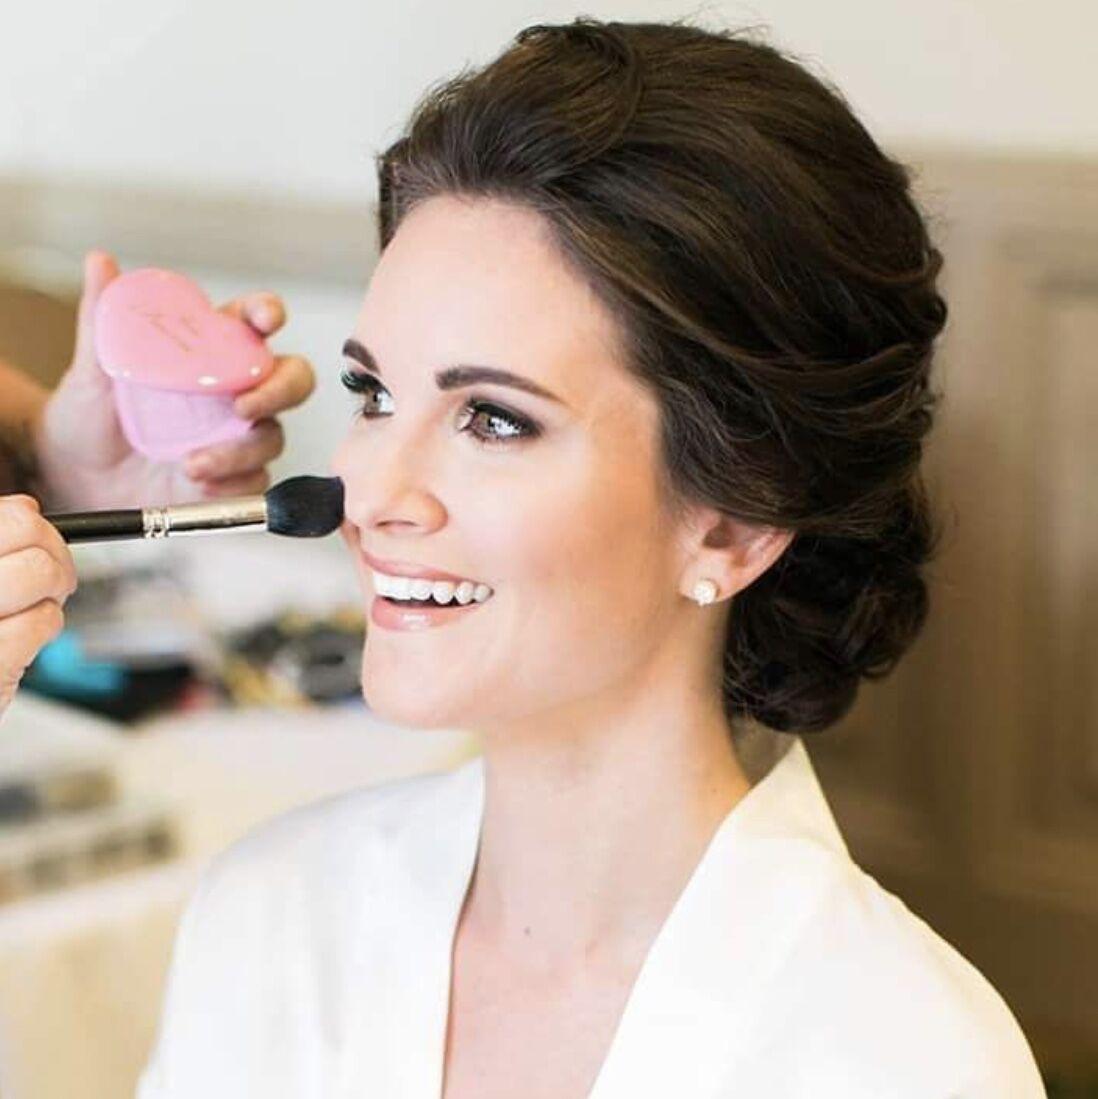 michelle makeup and hair | beauty - woodbridge, va